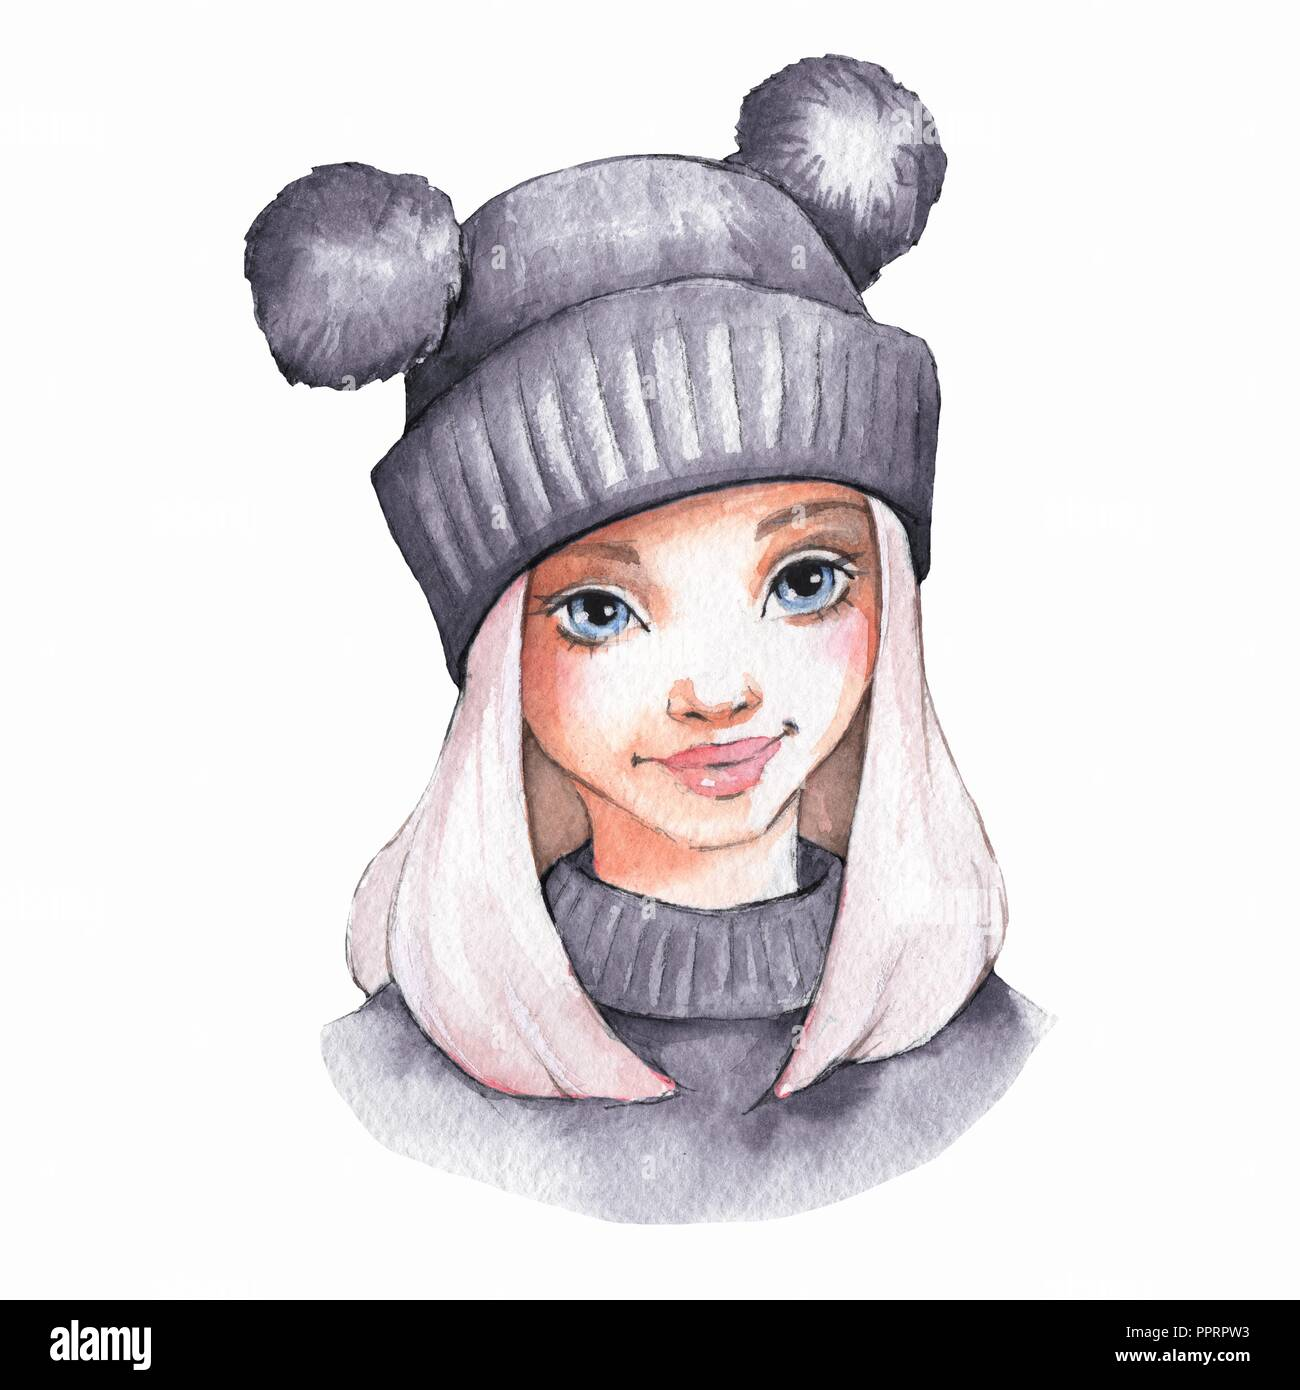 Cute Cartoon Girl In Warm Hat Watercolor Illustration Stock Photo